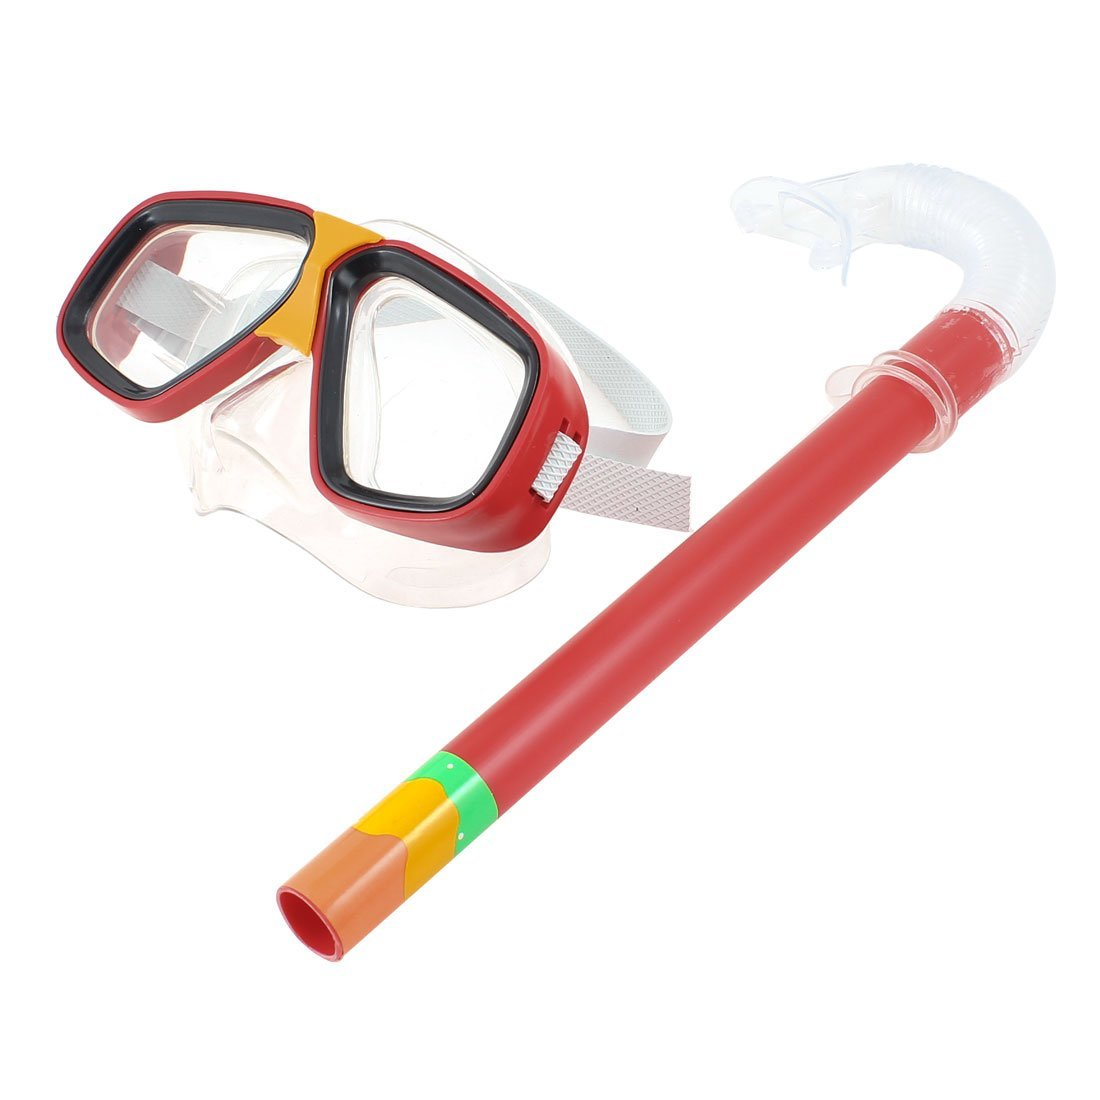 656d8d8b4de Get Quotations · Red Clear PVC Frame Swim Diving Scuba Goggles Mask Snorkel  Set